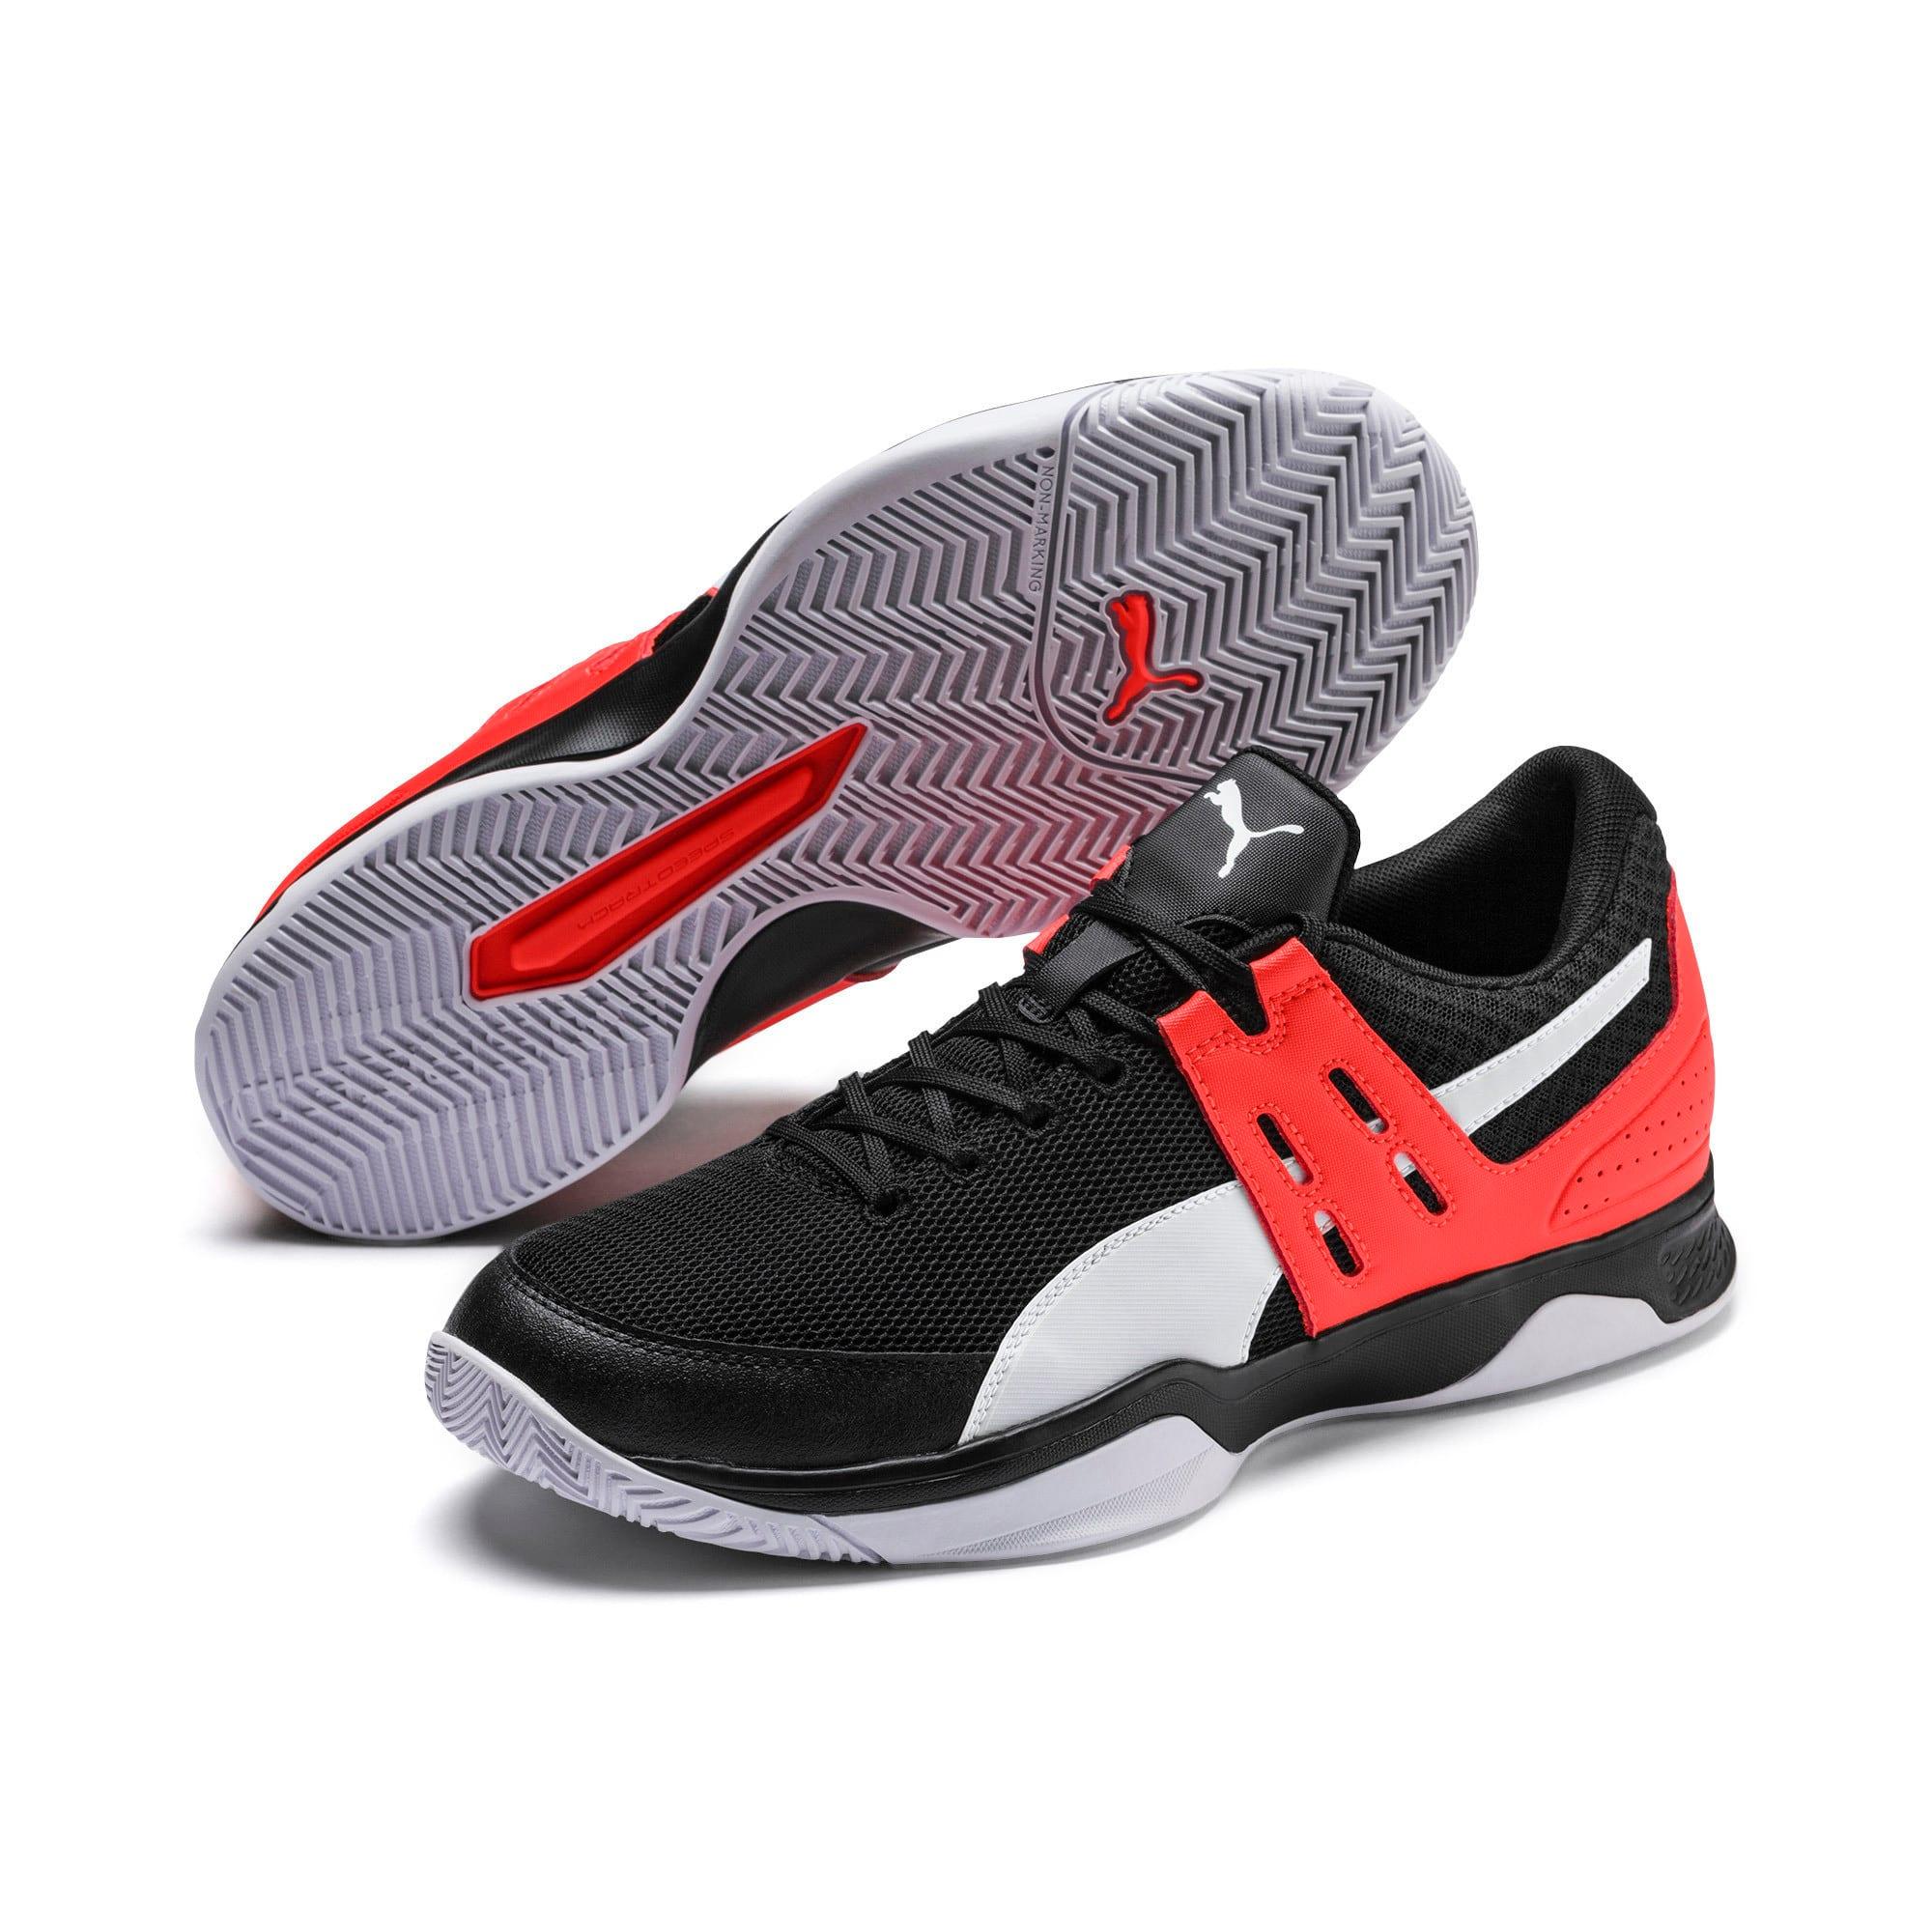 Thumbnail 3 of Boundless sportschoenen voor heren, Black-Nrgy Red-Puma White, medium